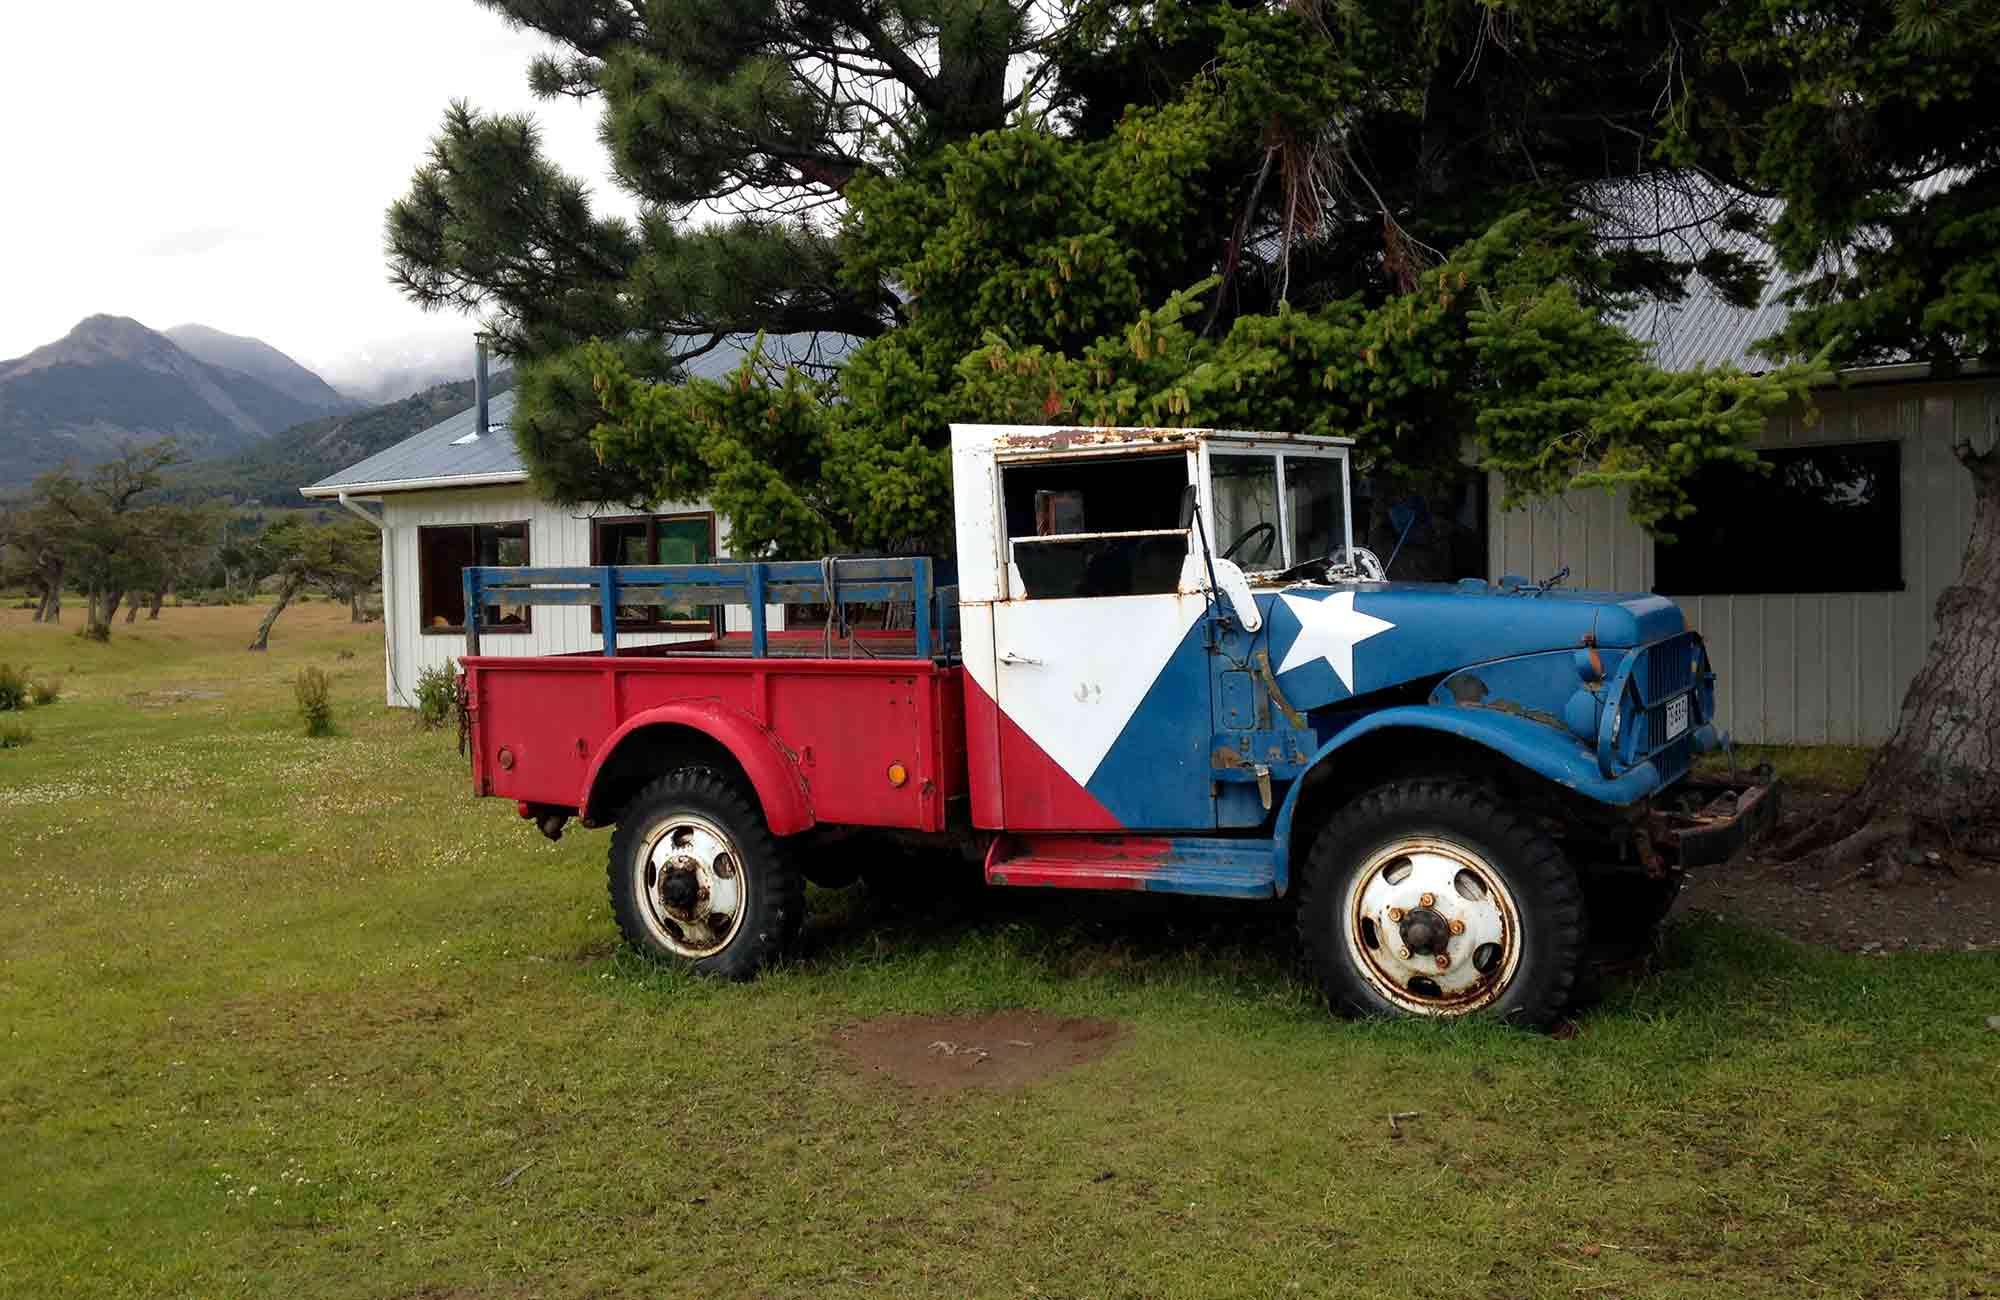 Voyage Chili - Truck Patagonie - Amplitudes